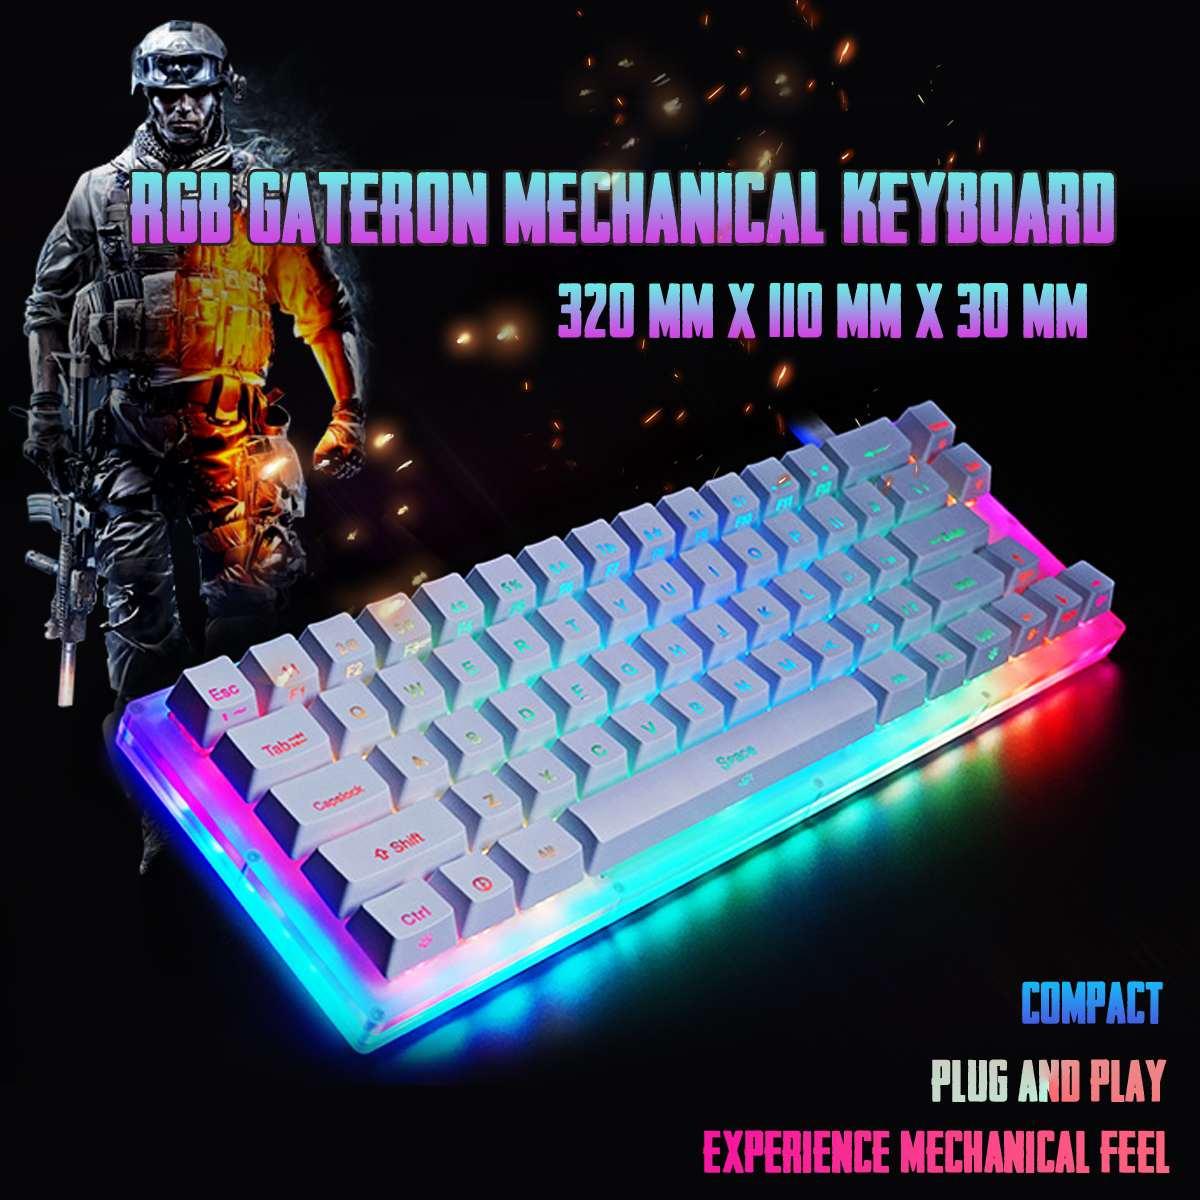 K66 Glazed Colorful Gateron Switch Mechanical Keyboard 40Gbps Type -C  66keys 16.8 Million RGB Crystalline Based Keyboard